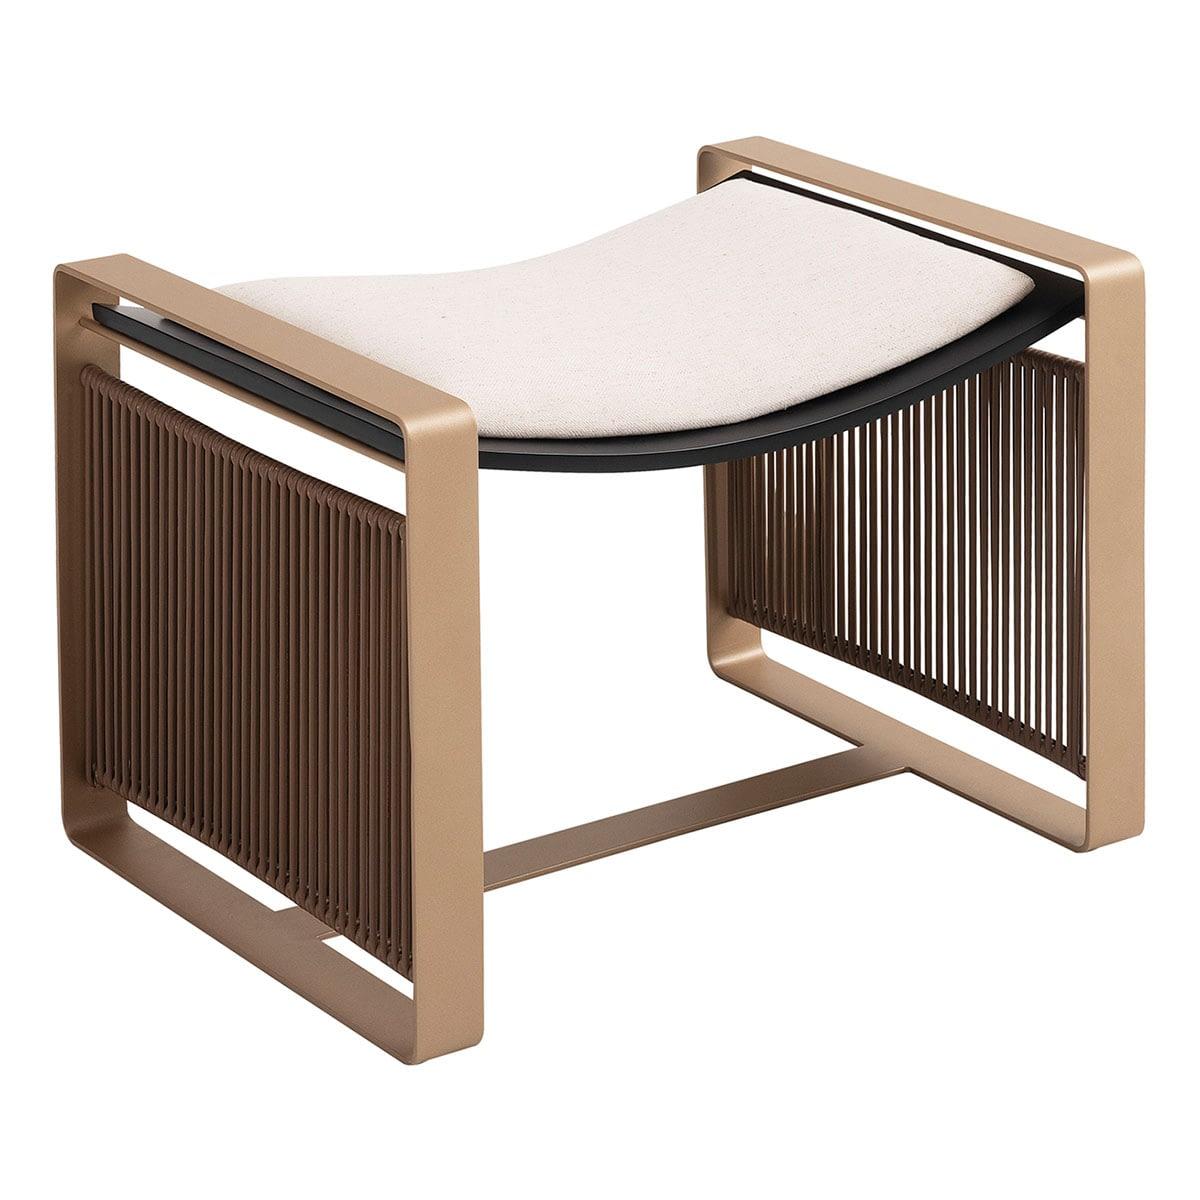 Brazilian Design Puff Barra Ottoman Designer Furniture Studio Marta Manente